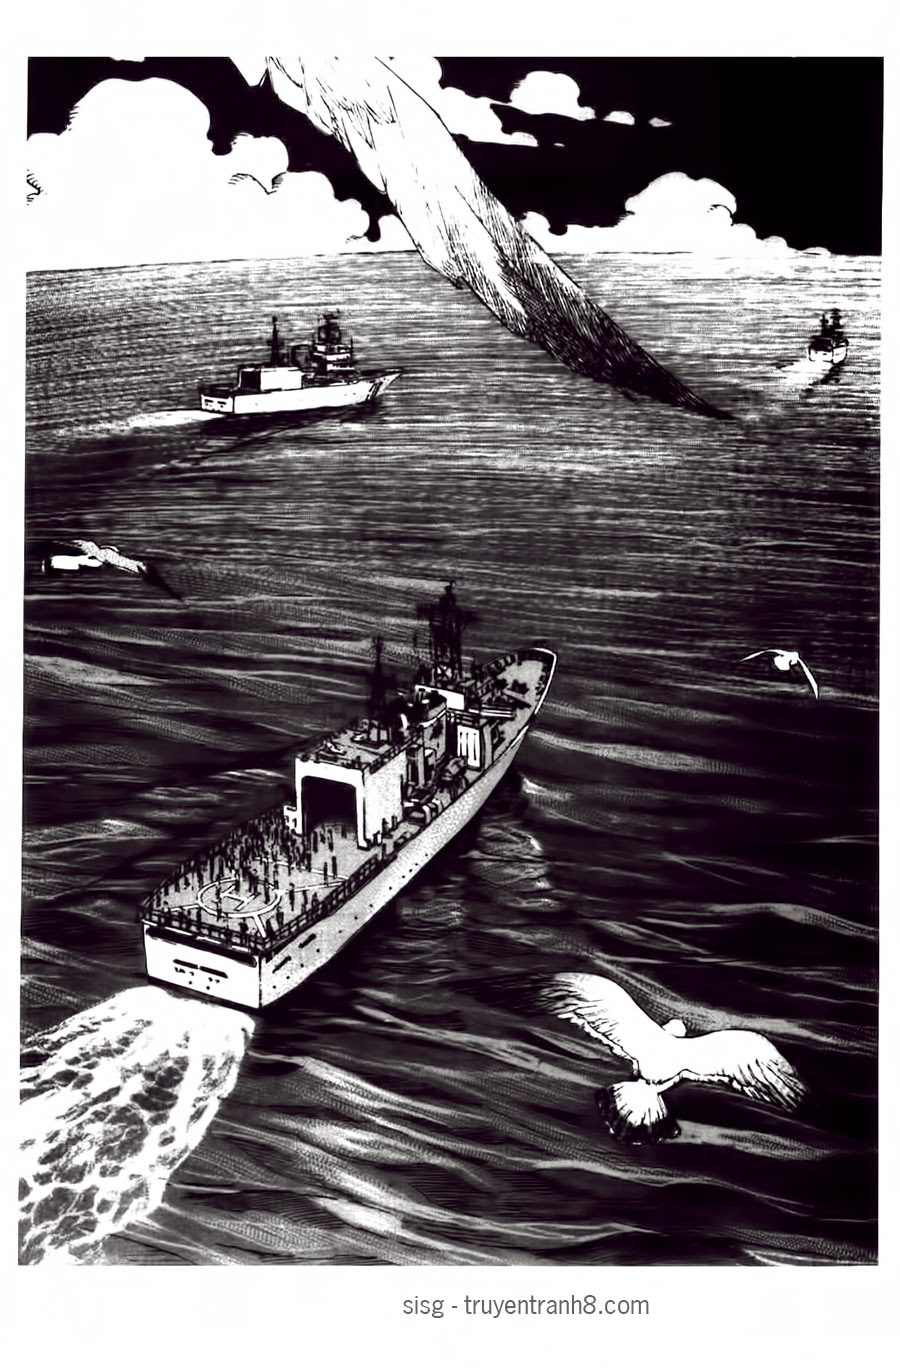 TT8 - Umizaru - Khỉ Biển Chap 119 - Truyen.Chap.VN